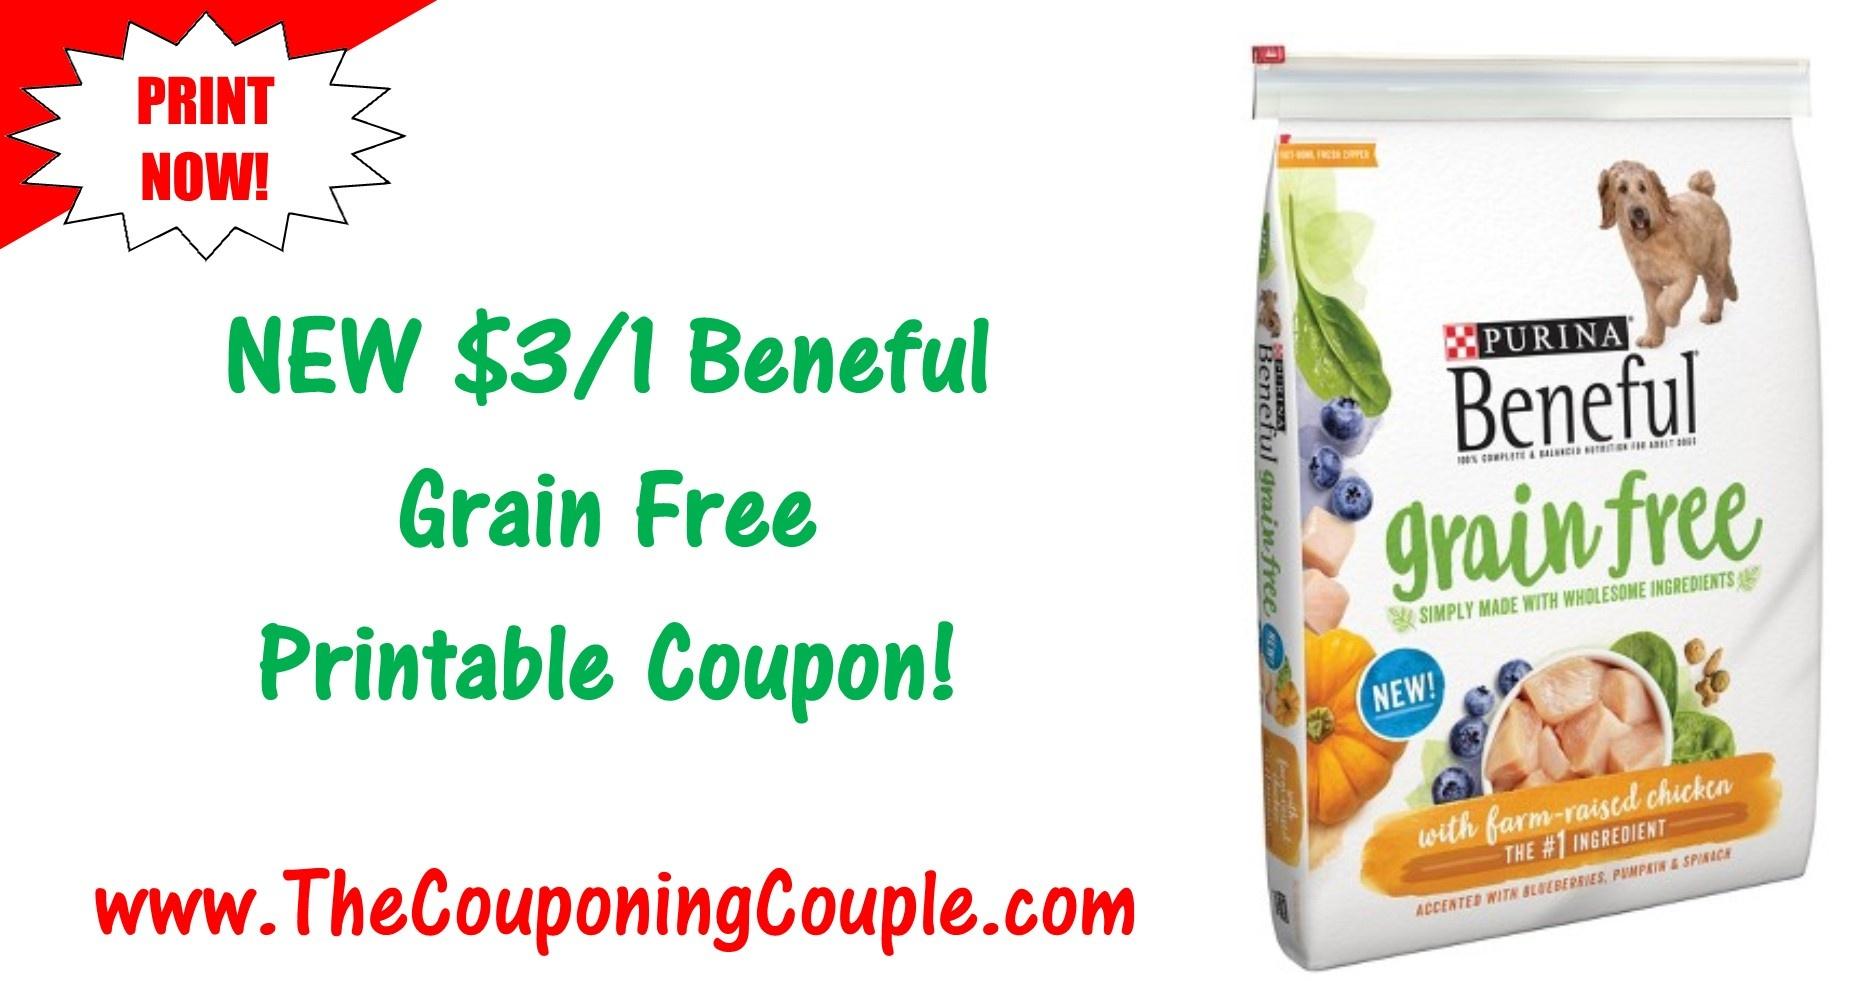 New Beneful Printable Coupon ~ $3.00/1 Beneful Grain Free Dog Food! - Free Printable Dog Food Coupons